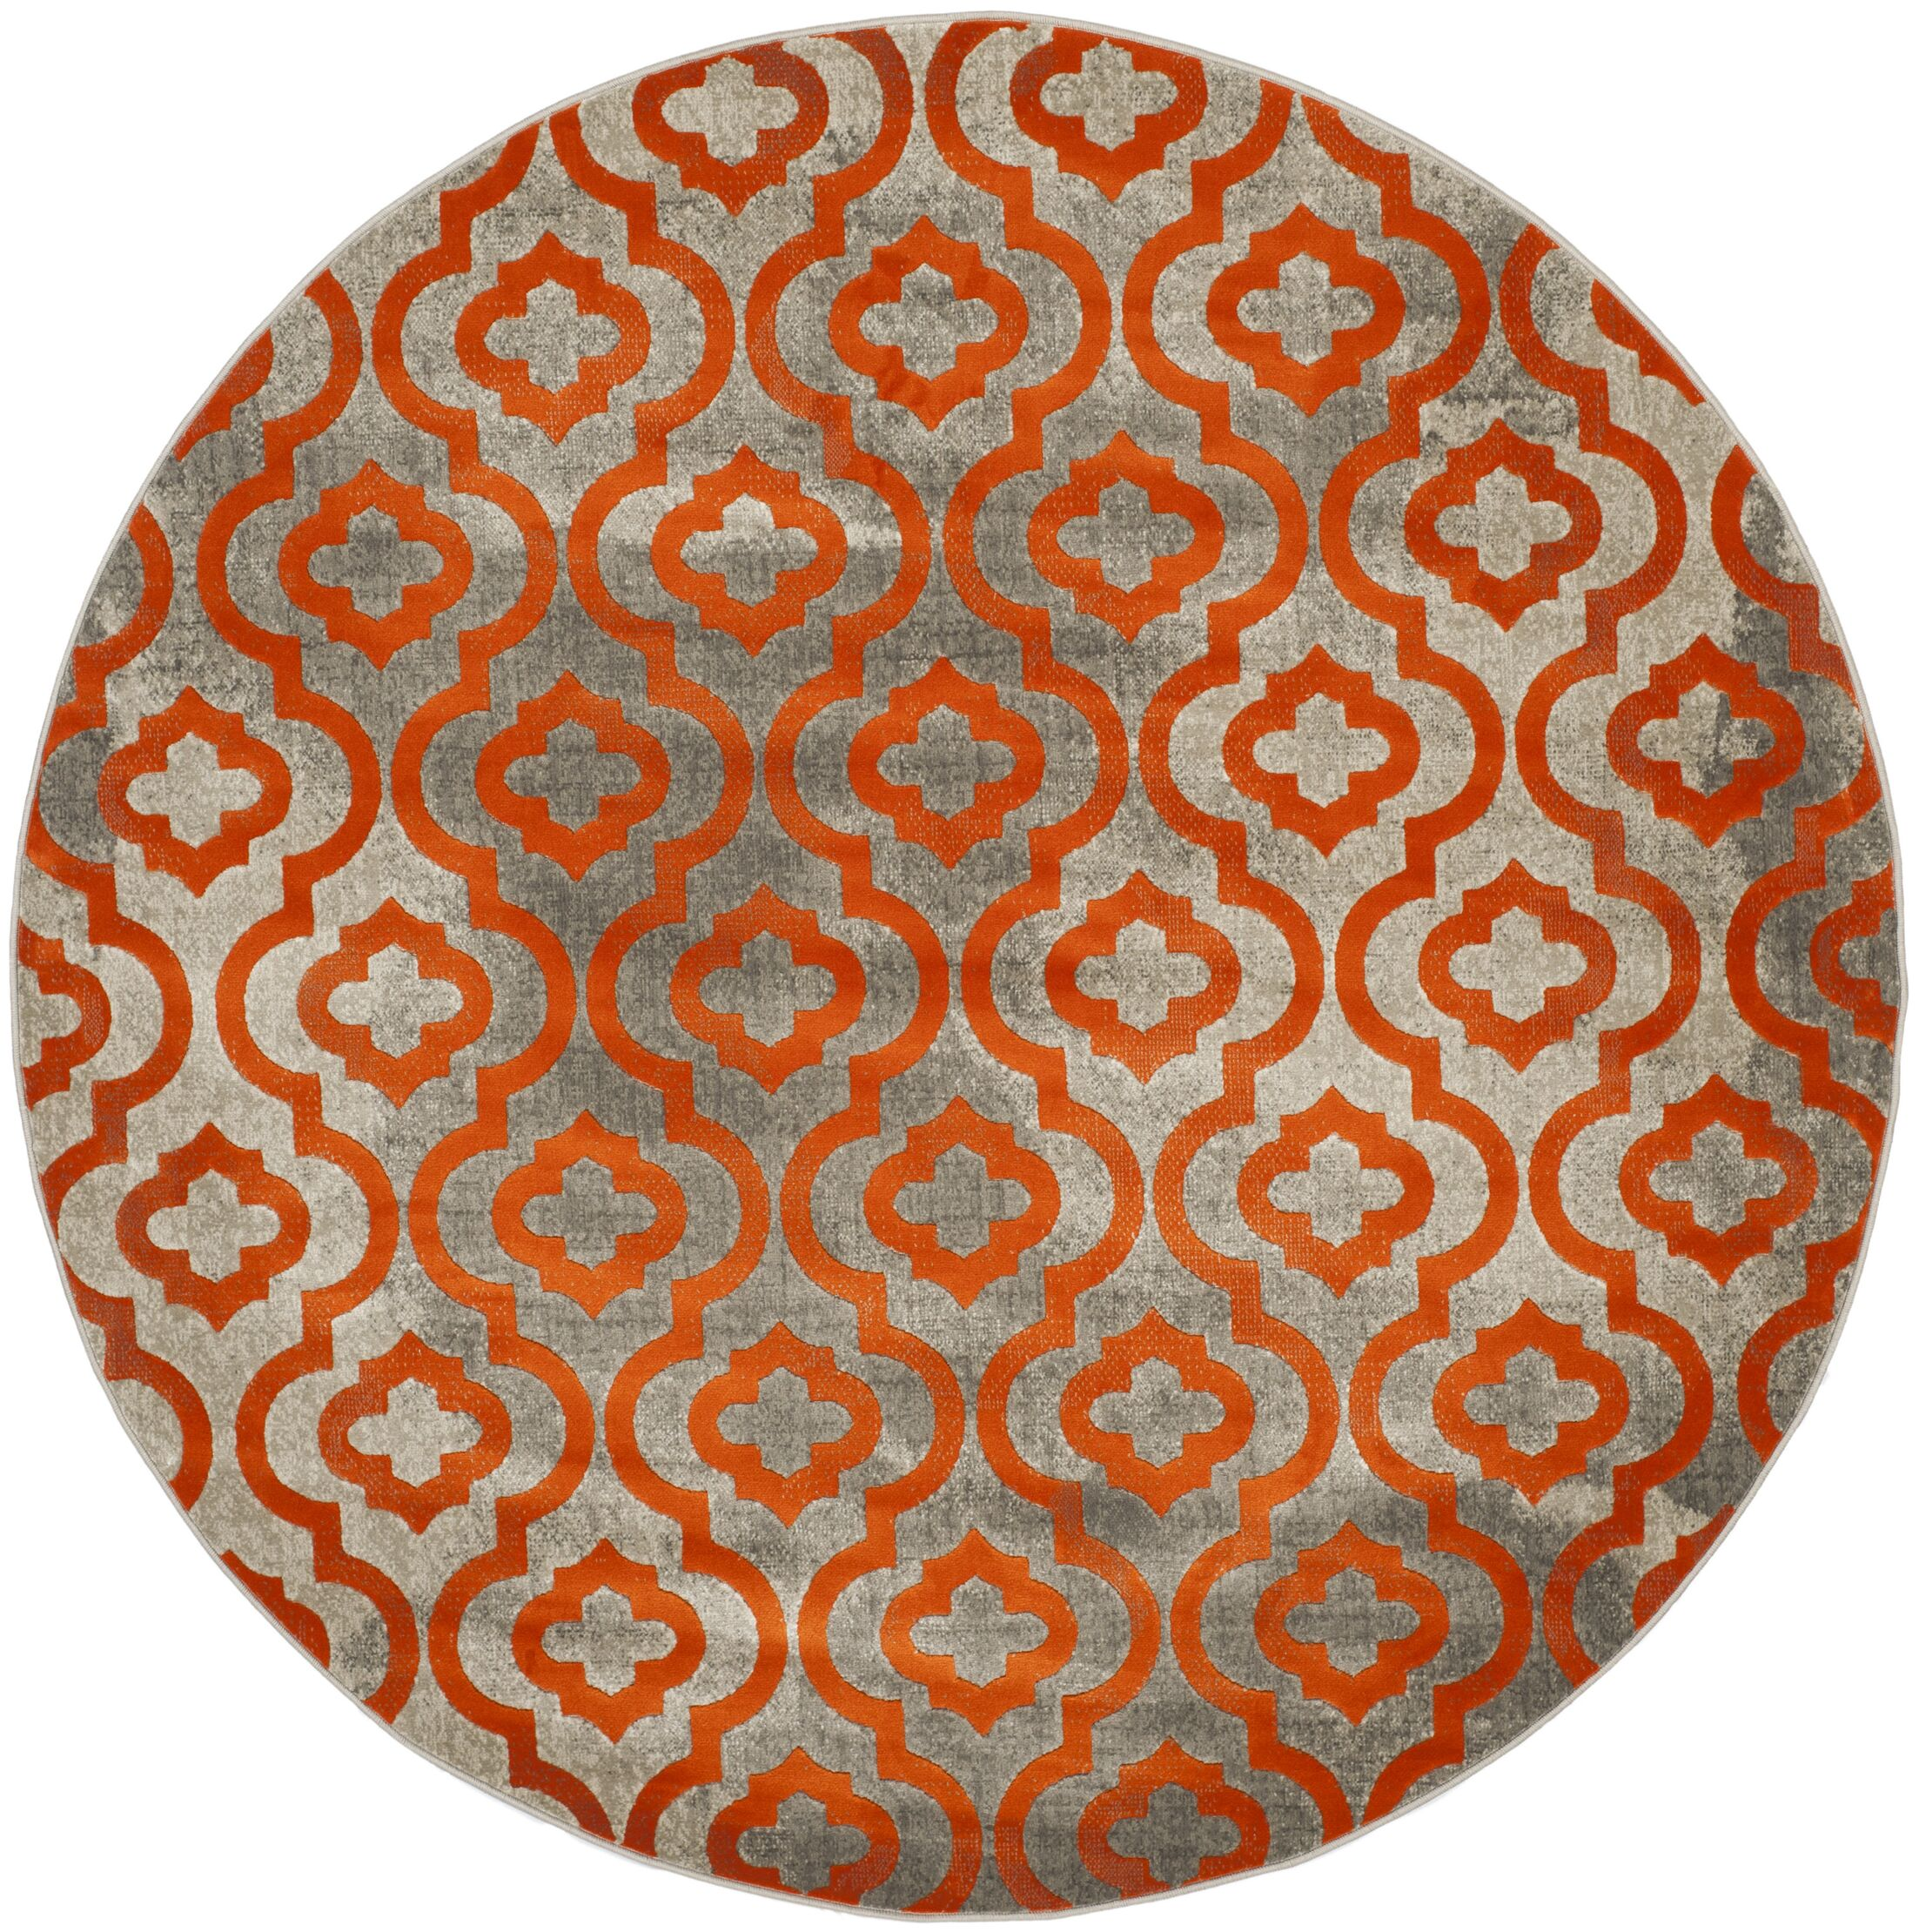 Manorhaven Light Gray/Orange Area Rug Rug Size: Rectangle 9' x 12'